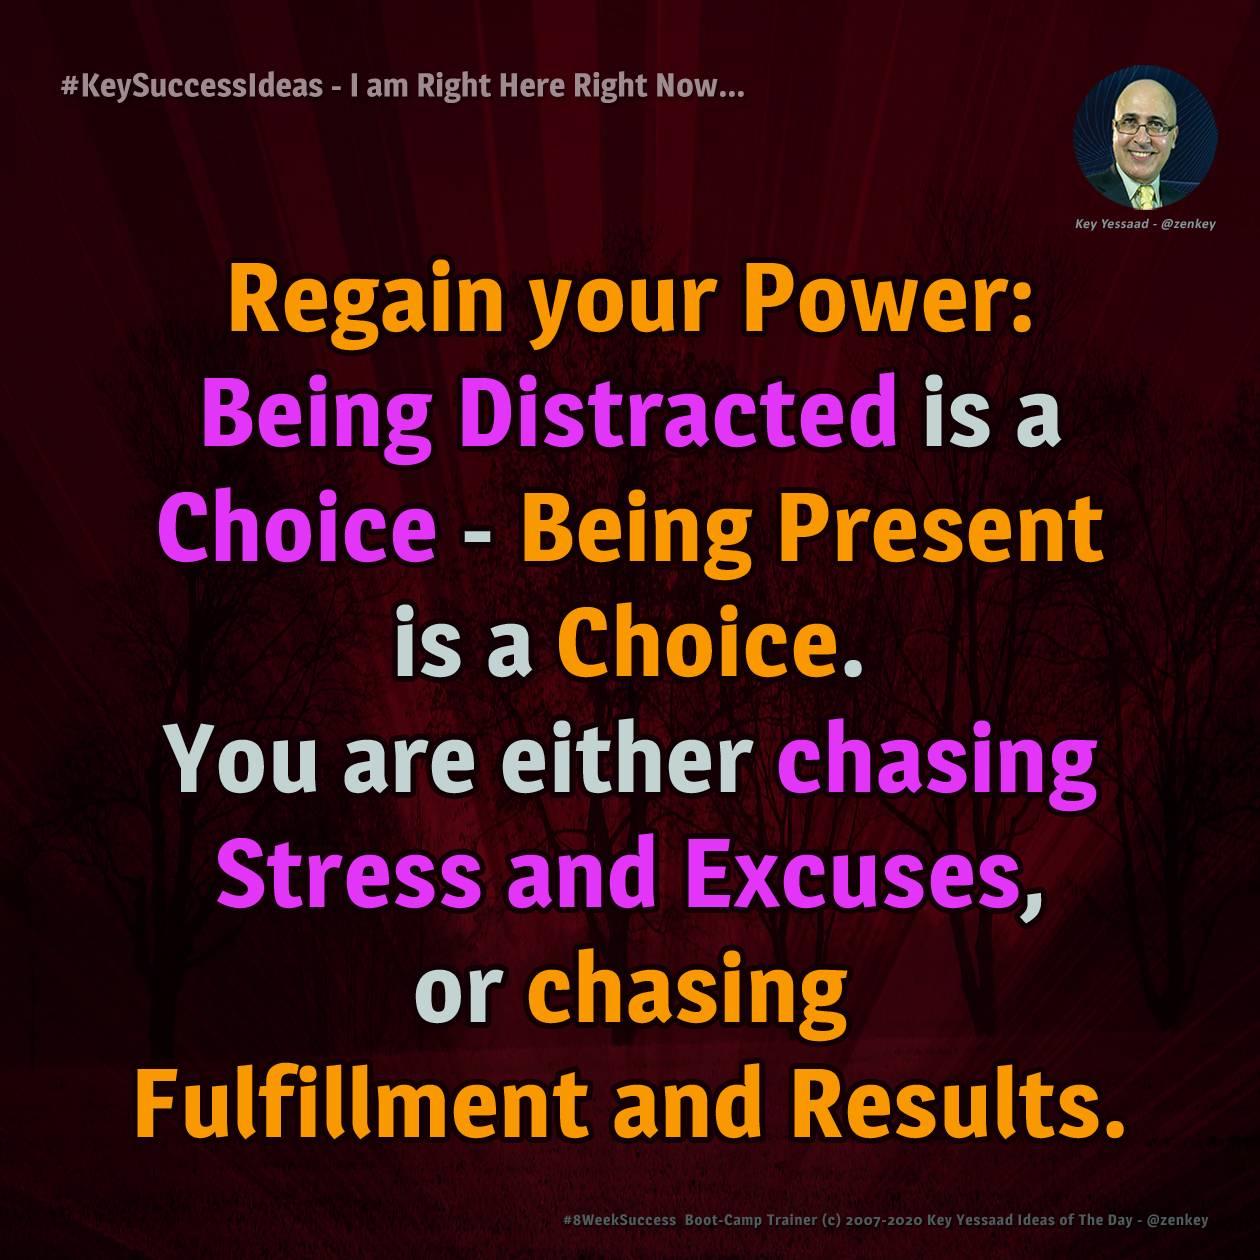 #KeySuccessIdeas - I am Right Here Right Now...